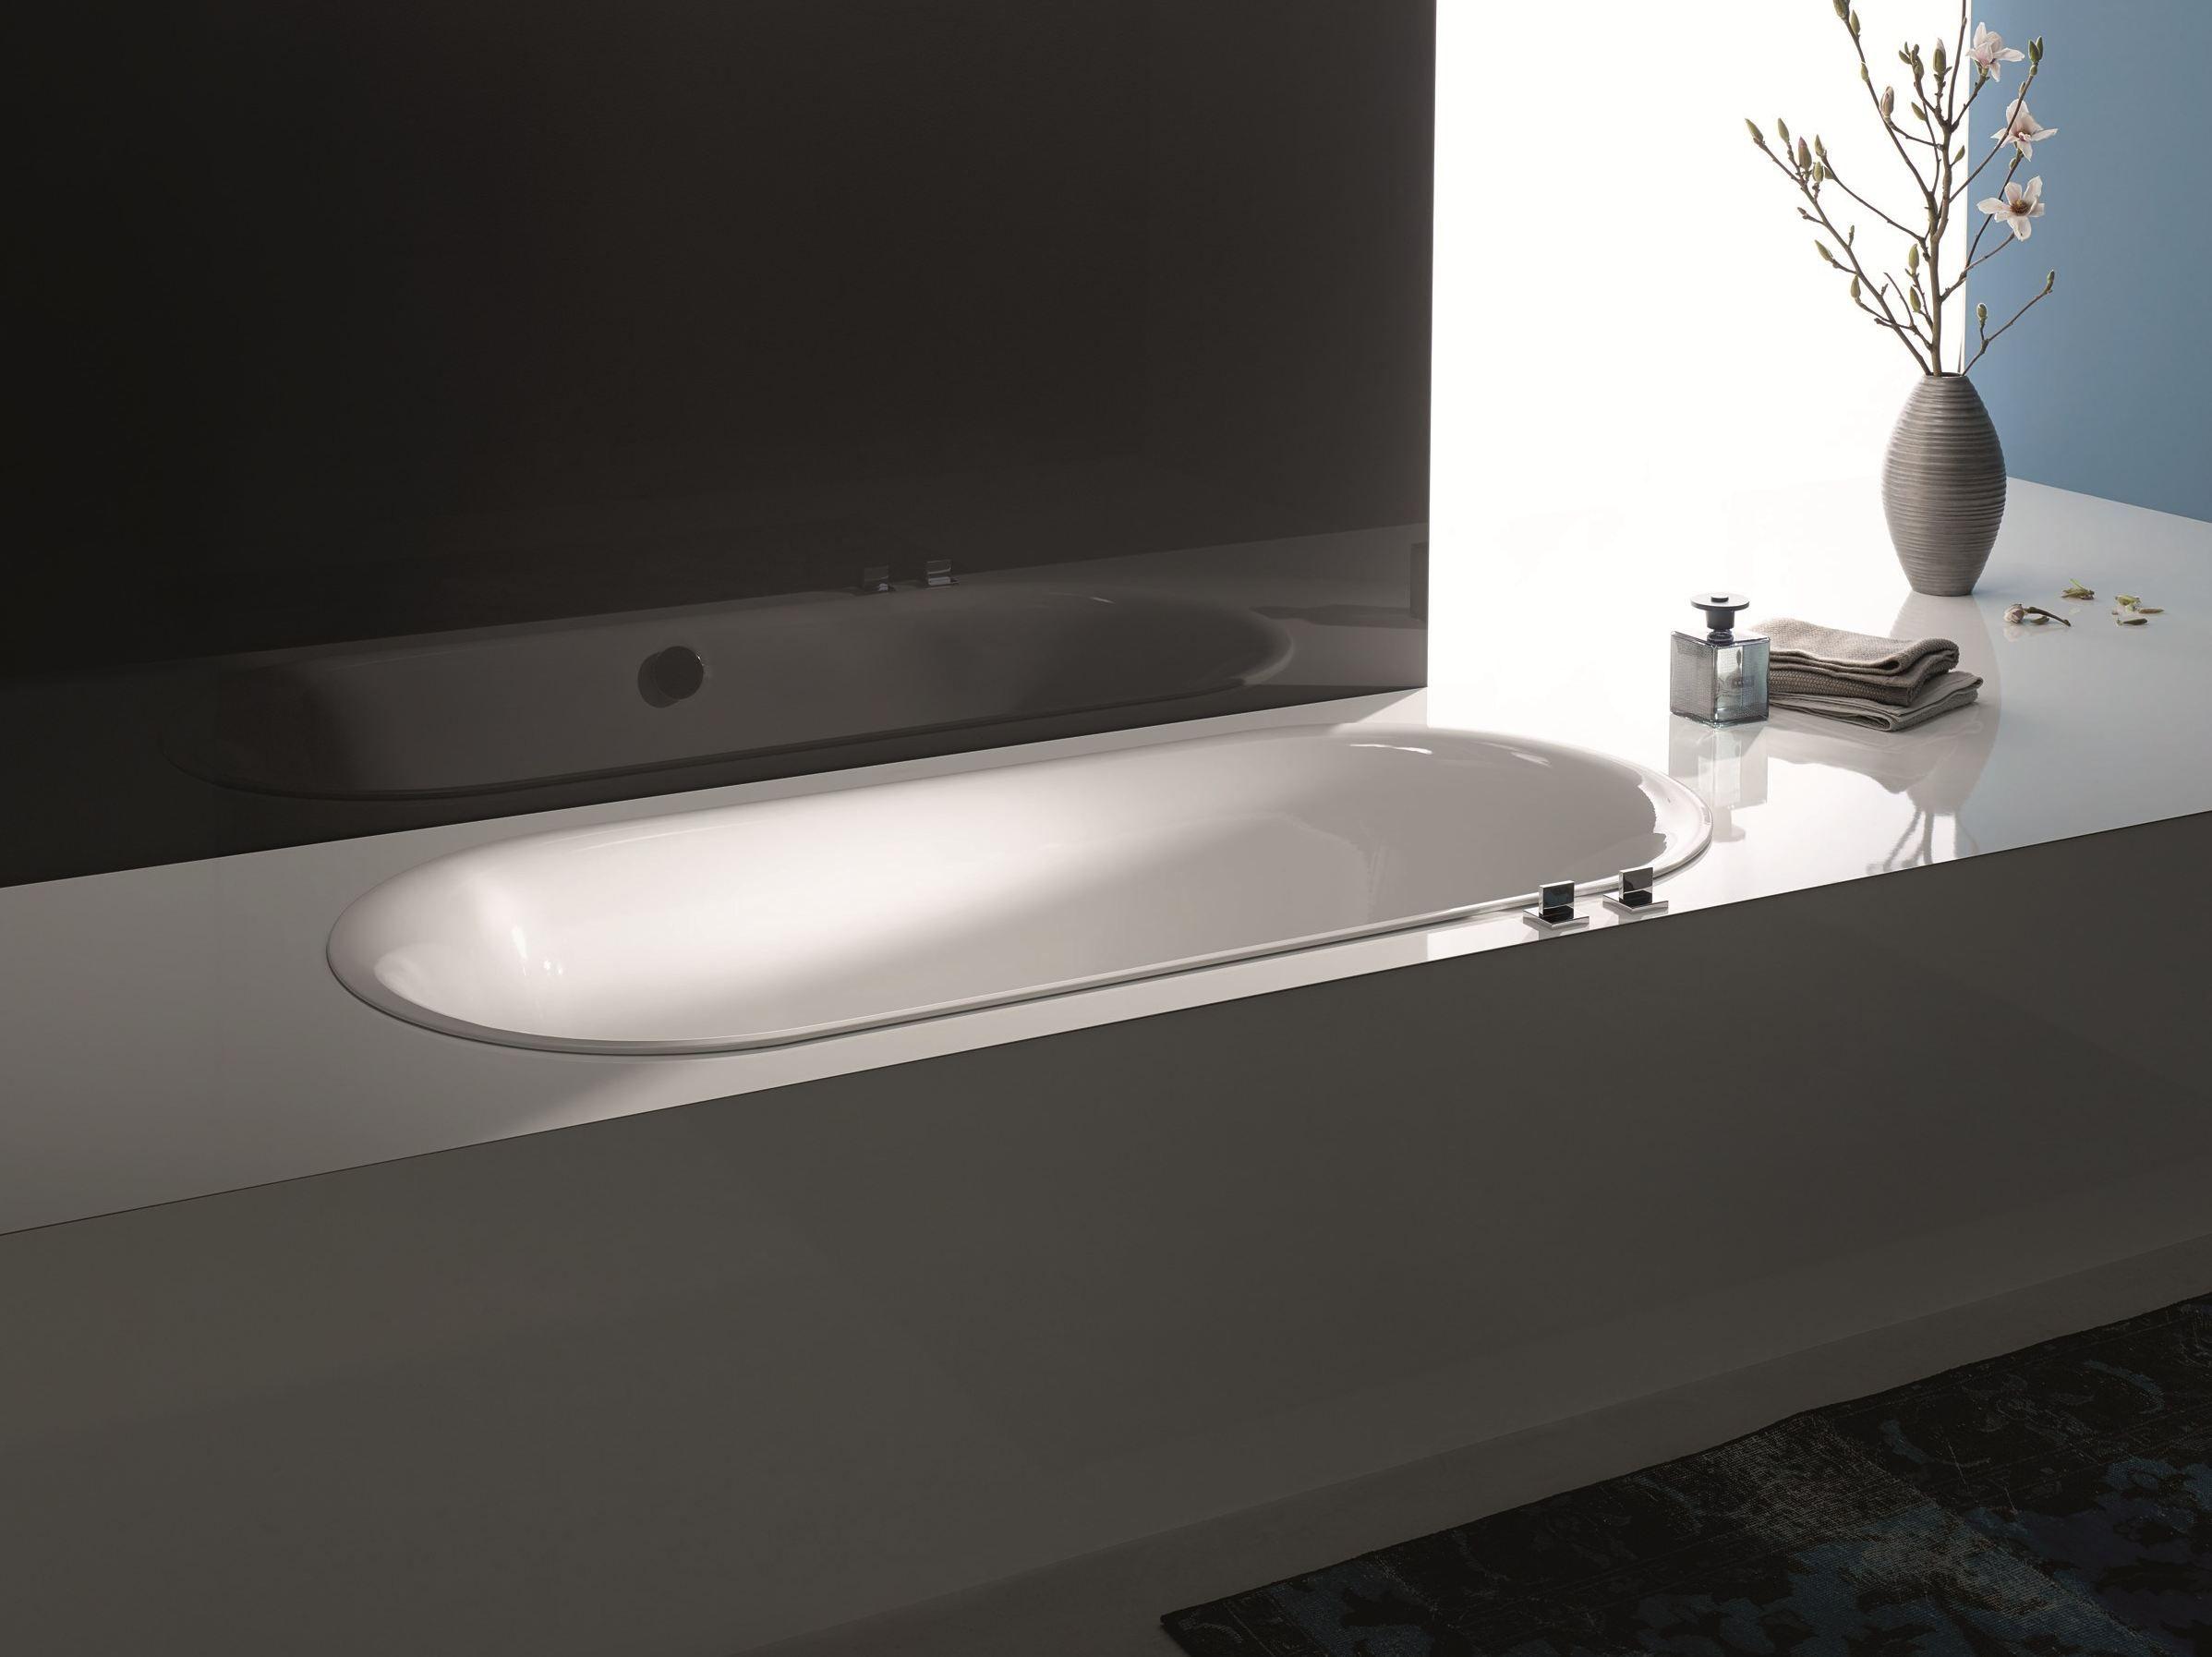 einbau badewanne oval carport 2017. Black Bedroom Furniture Sets. Home Design Ideas